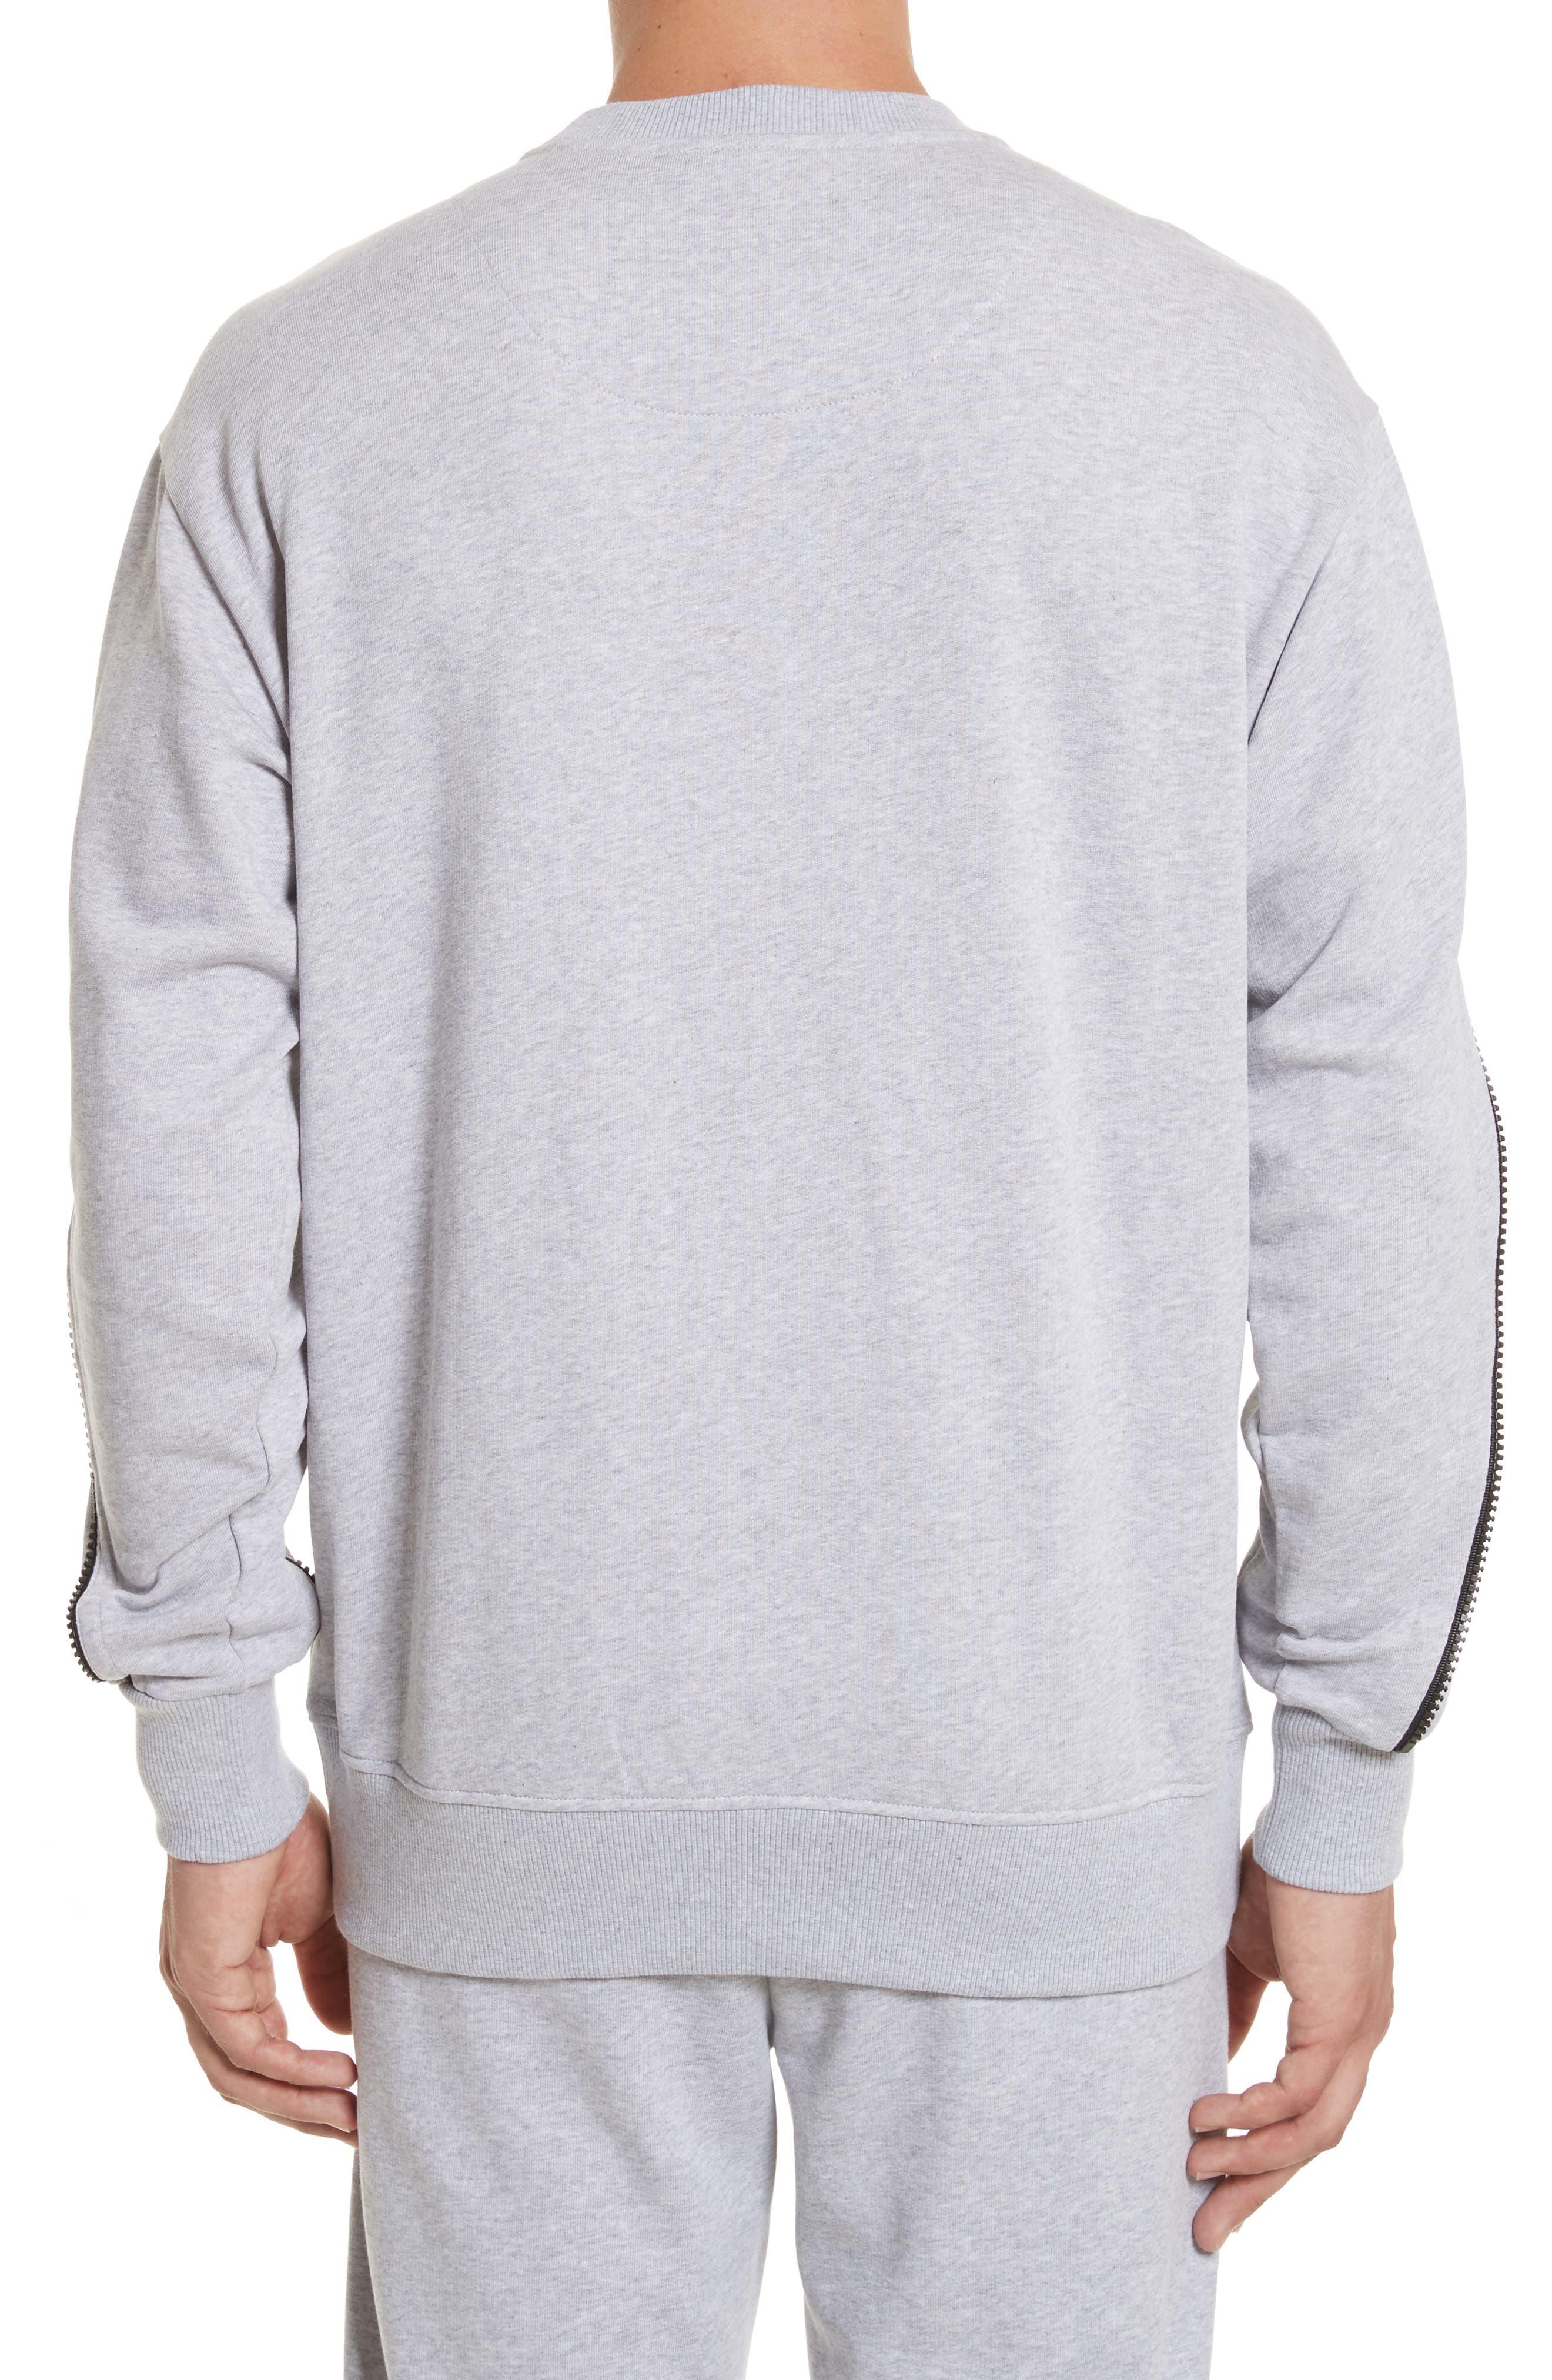 Zip Sleeve Crewneck Sweatshirt,                             Alternate thumbnail 2, color,                             GREY